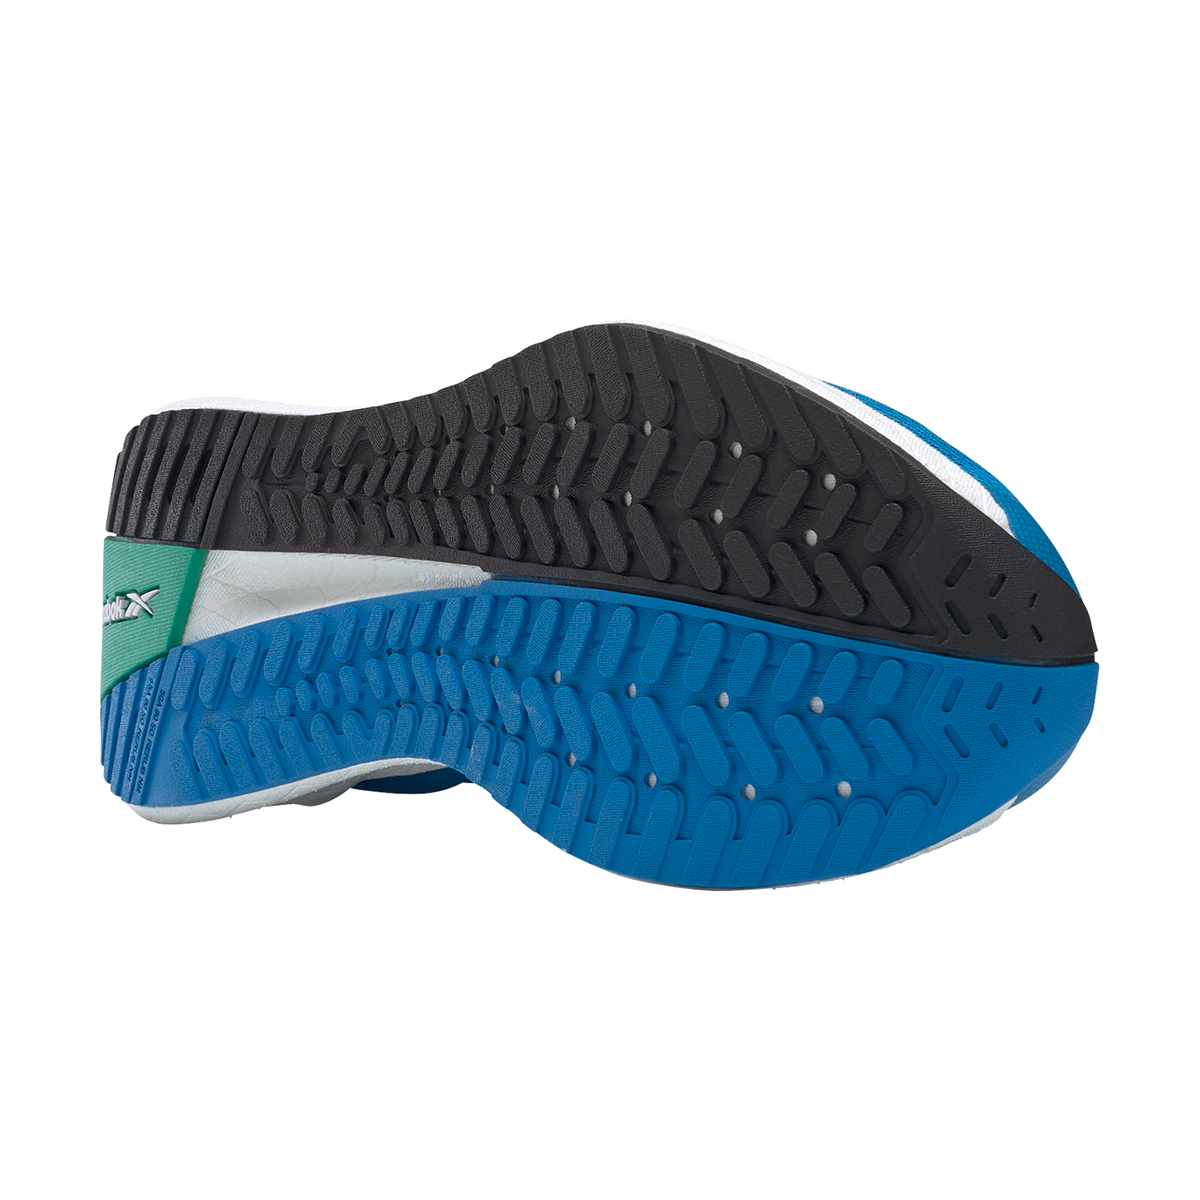 Men's Reebok Floatride Energy Symmetros Running Shoe - Color: Dynamic Blue/Horizon Blue/Court Green - Size: 7 - Width: Regular, Dynamic Blue/Horizon Blue/Court Green, large, image 6